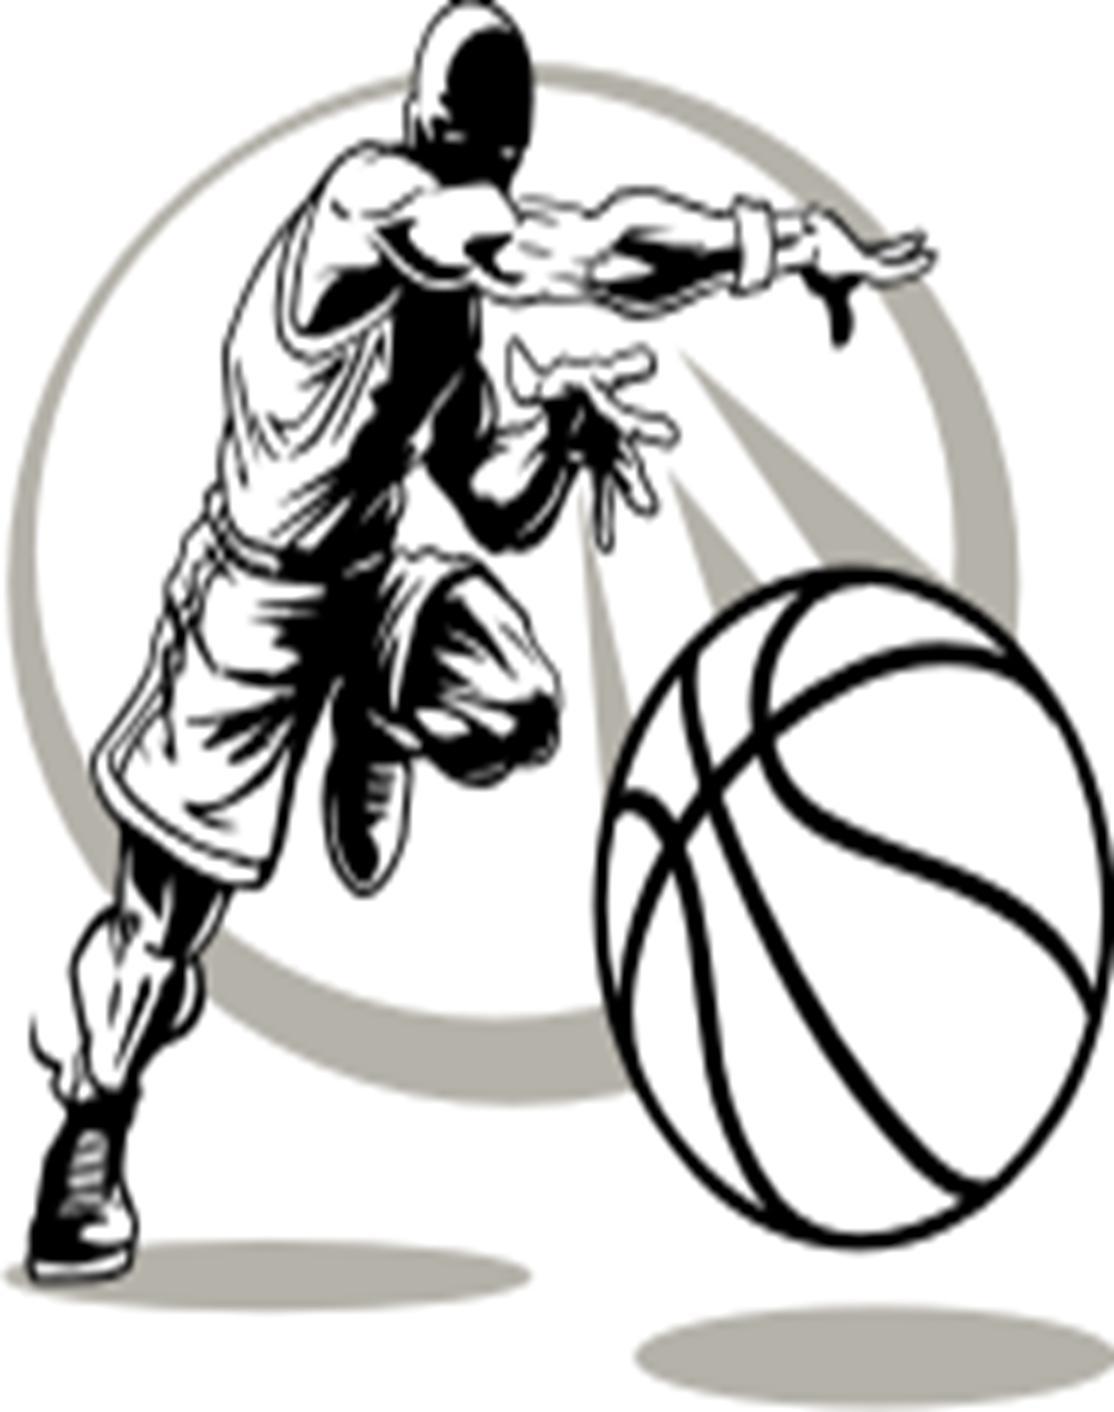 Player panda free images. Basketball clipart basketball game